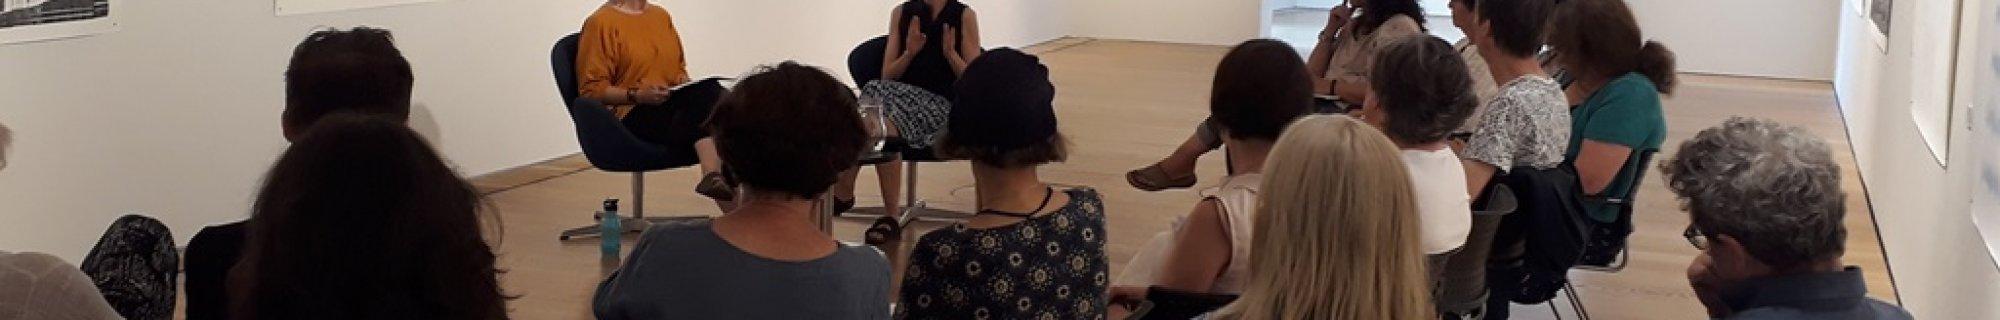 Artist julie merriman discussing her artwork